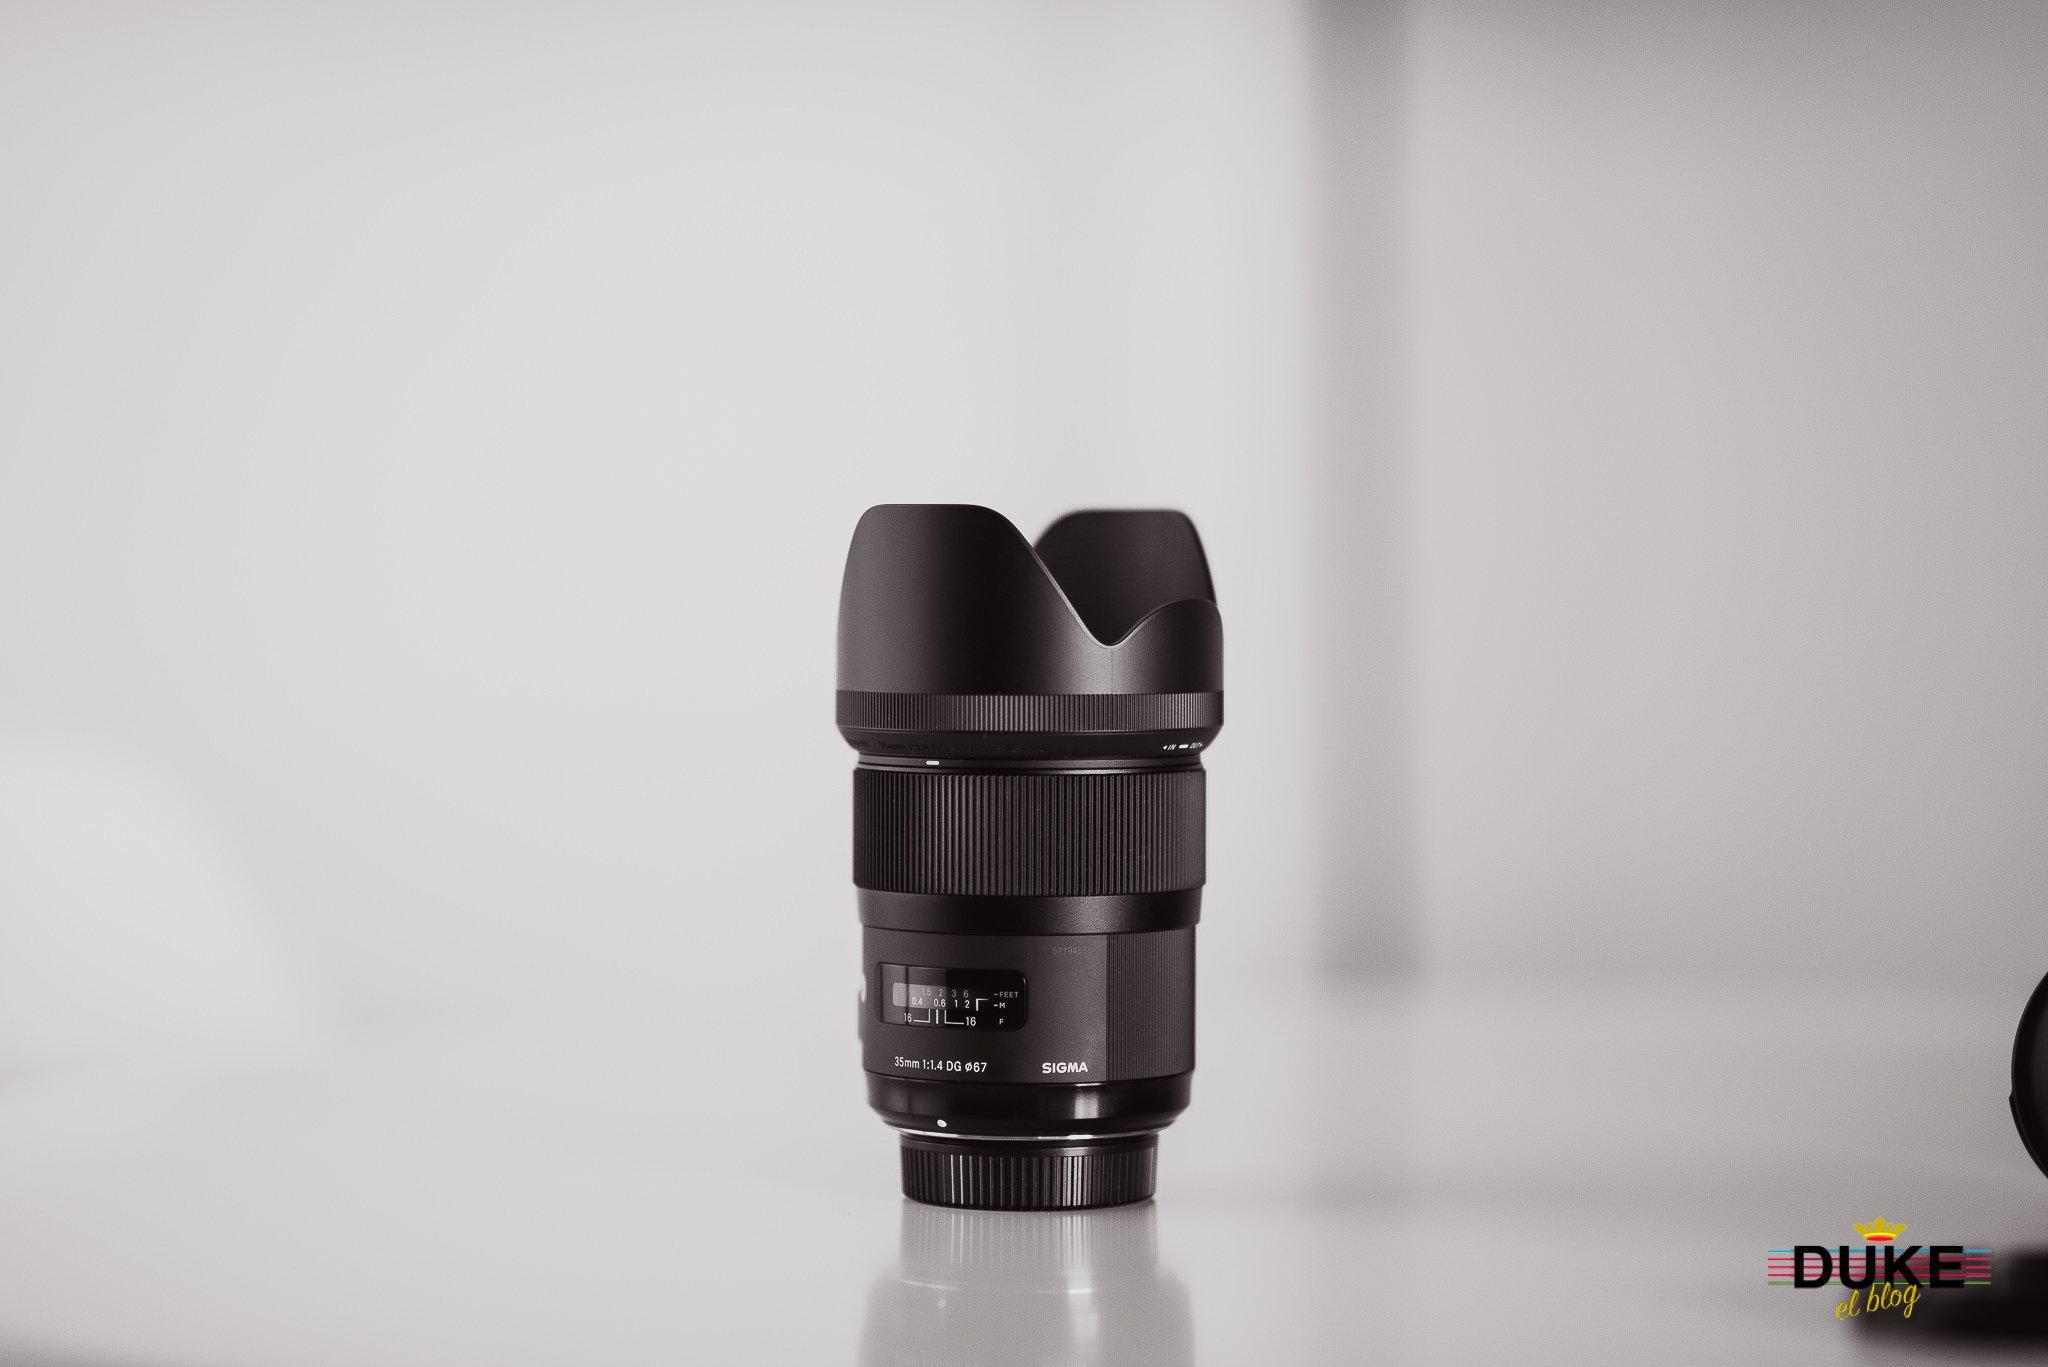 sigma 35mm 1.4 art, sigma, duke fotografia, duke fotografia blog, blog, duke fotografia,